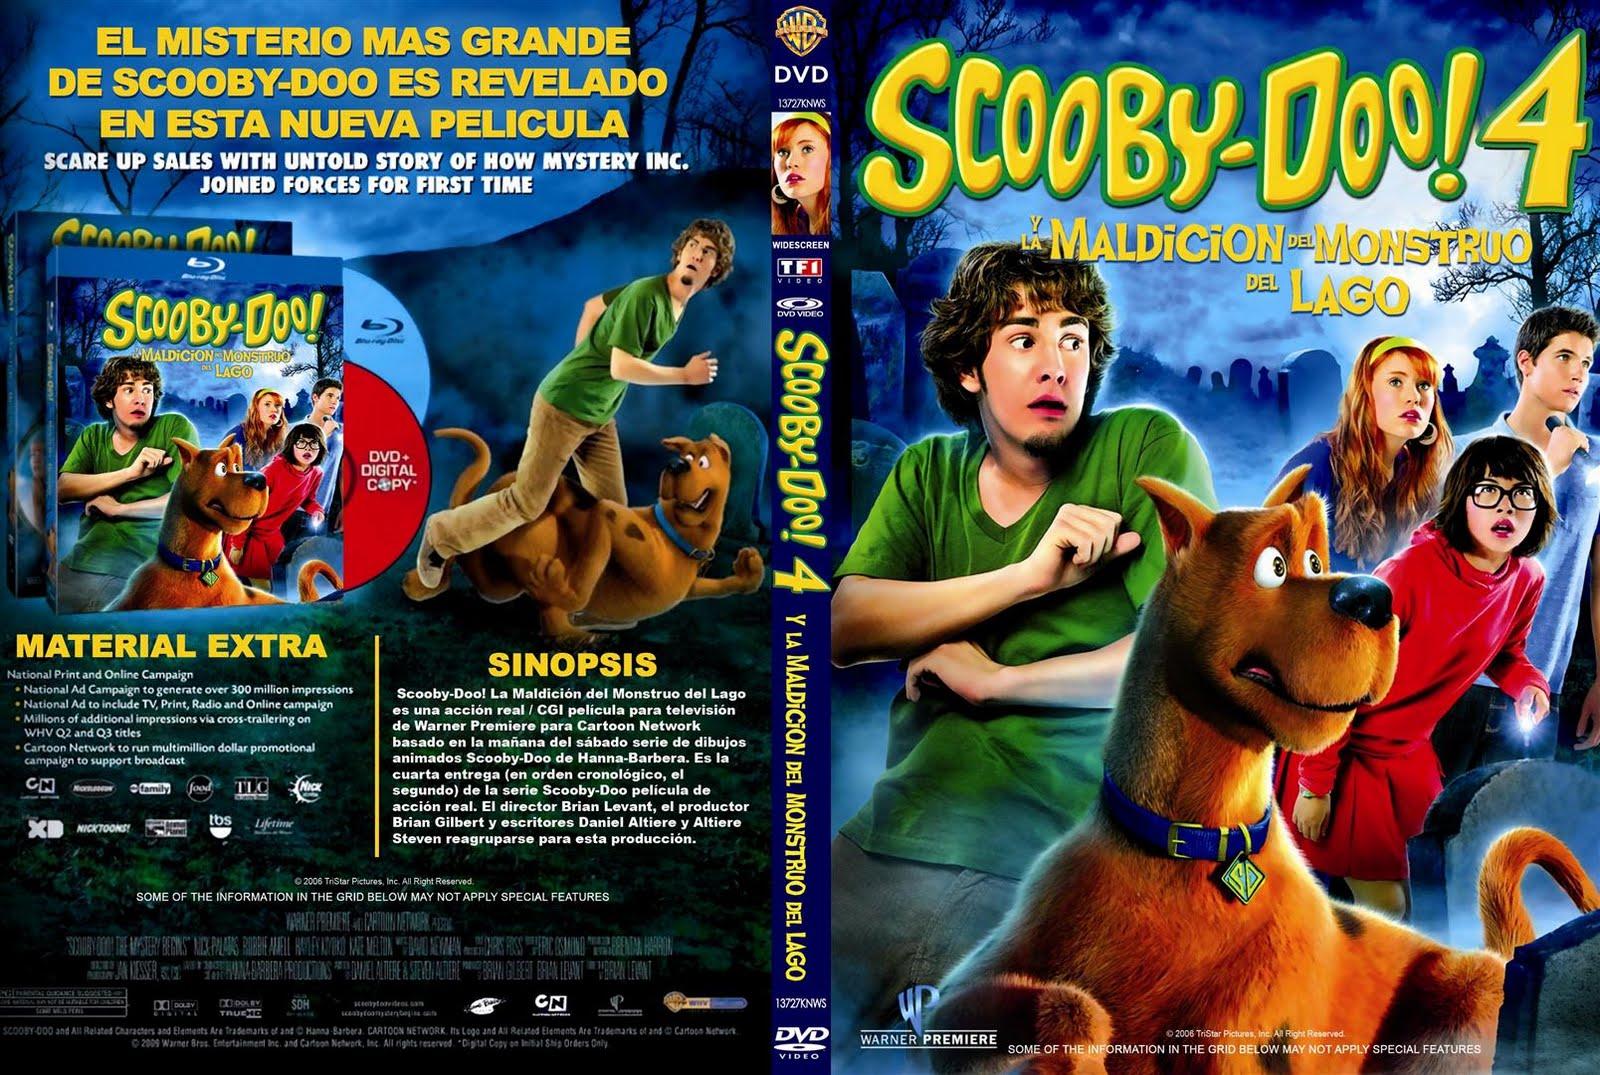 Nessa nova historia ScoobyDoo